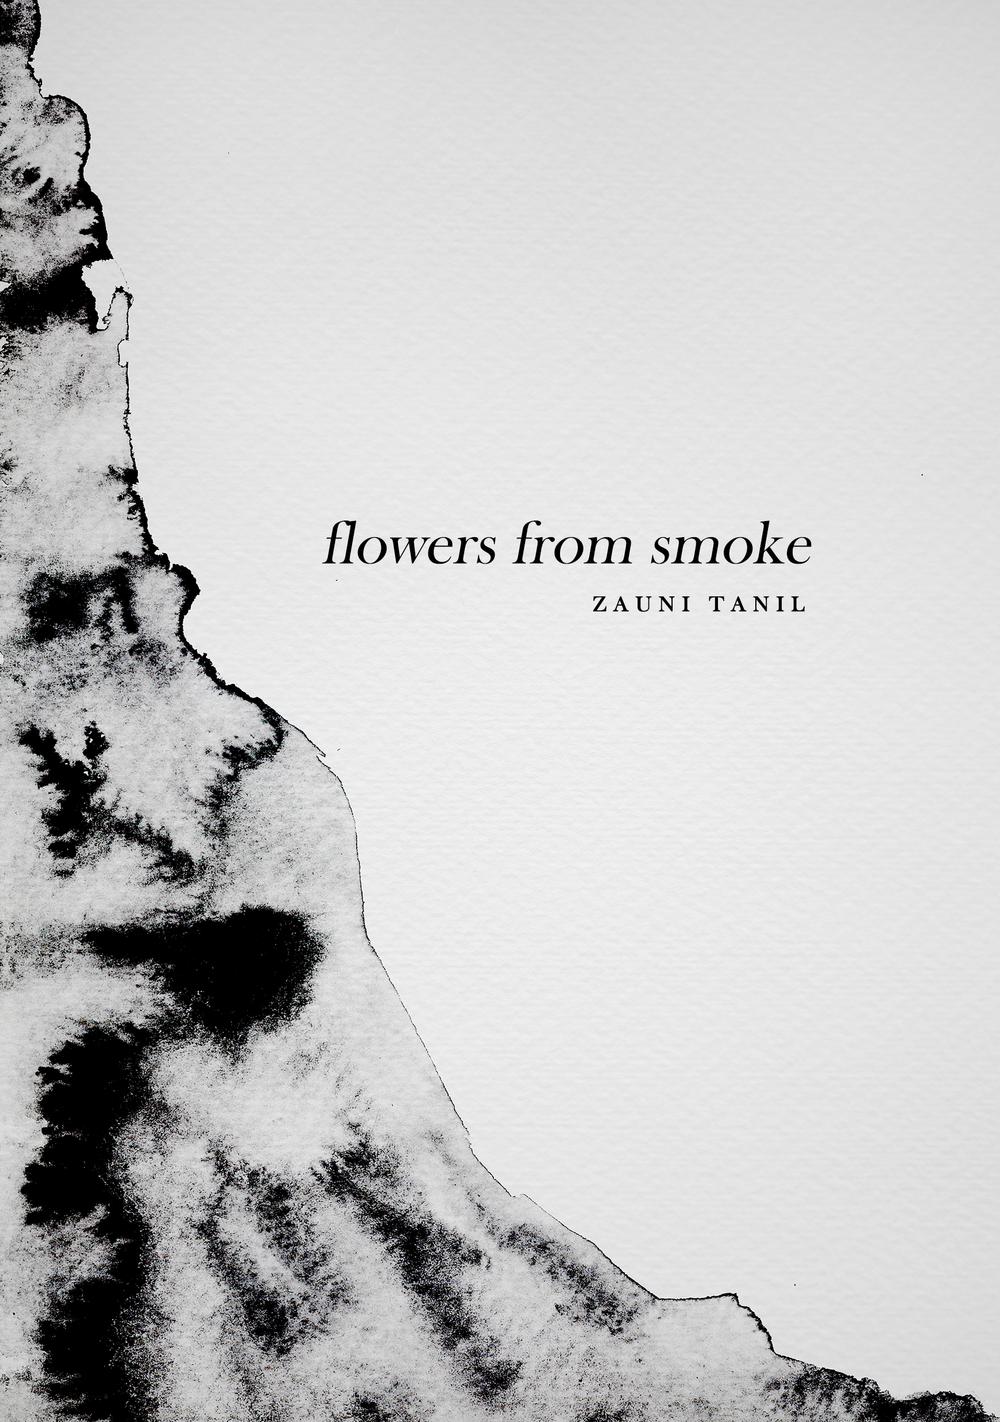 flowersfromsmokehalfcover.png